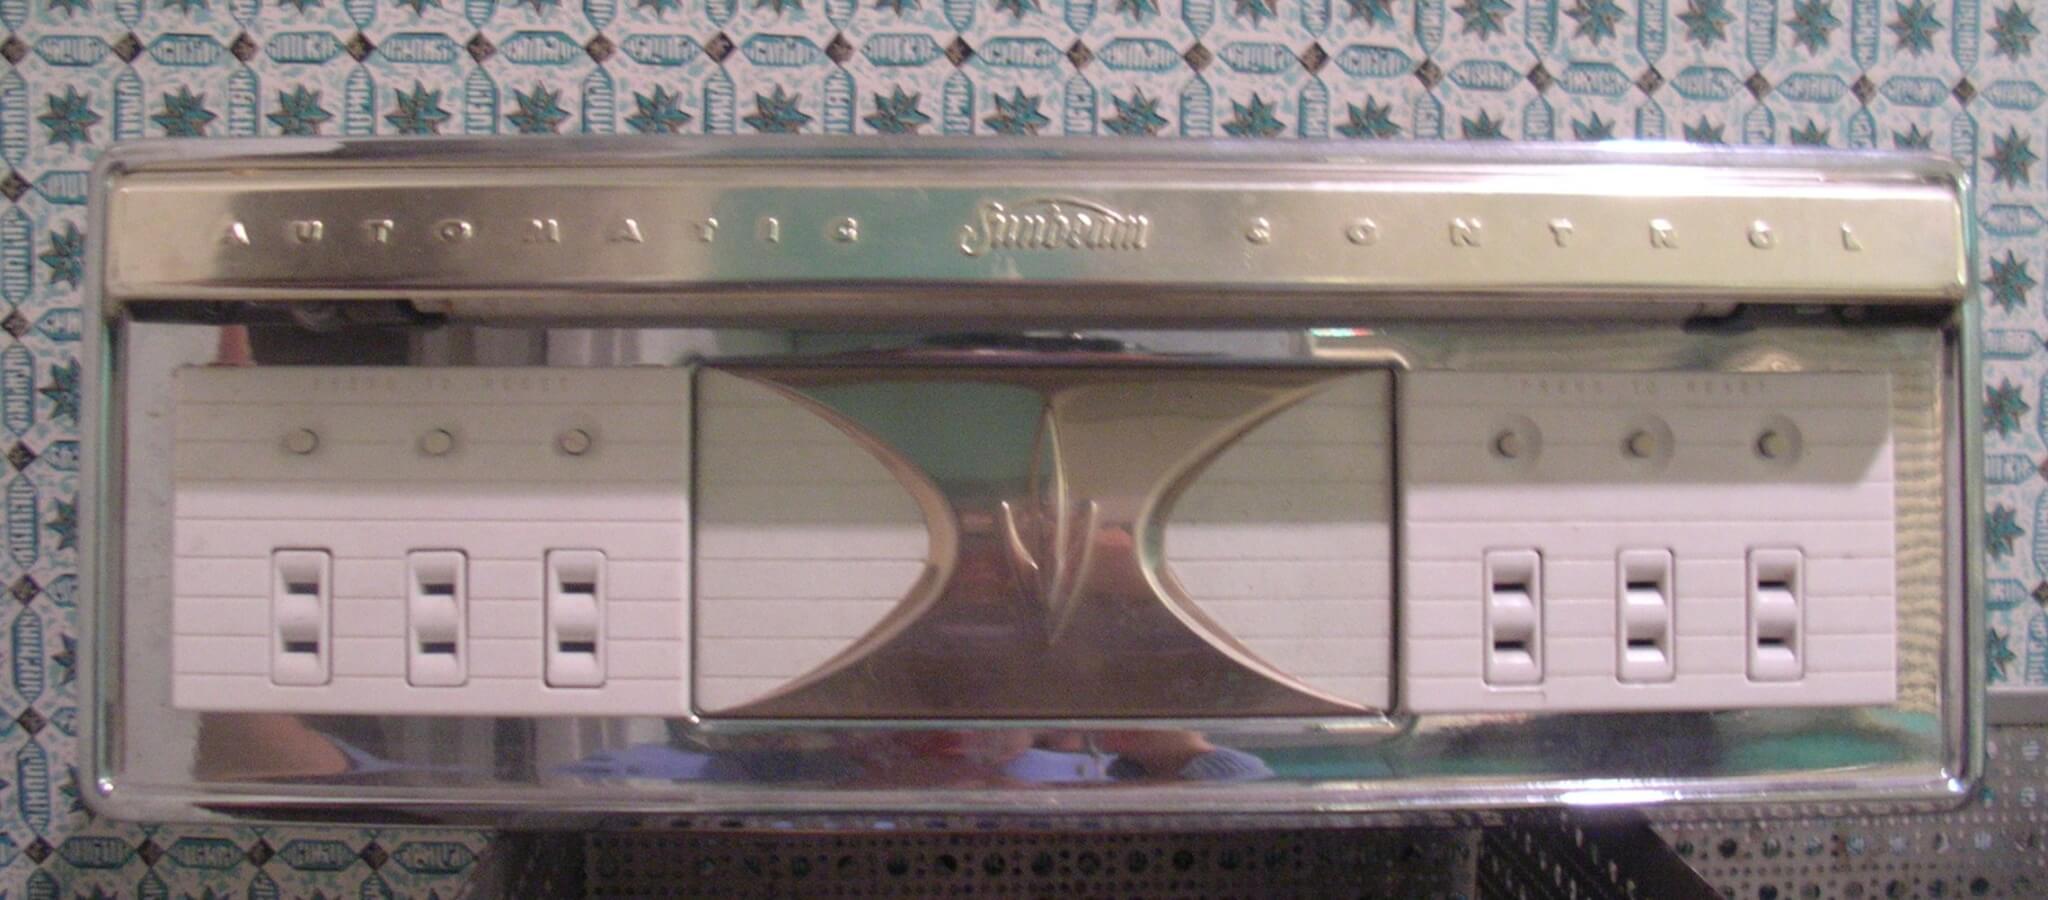 mint-in-box Sunbeam appliance center